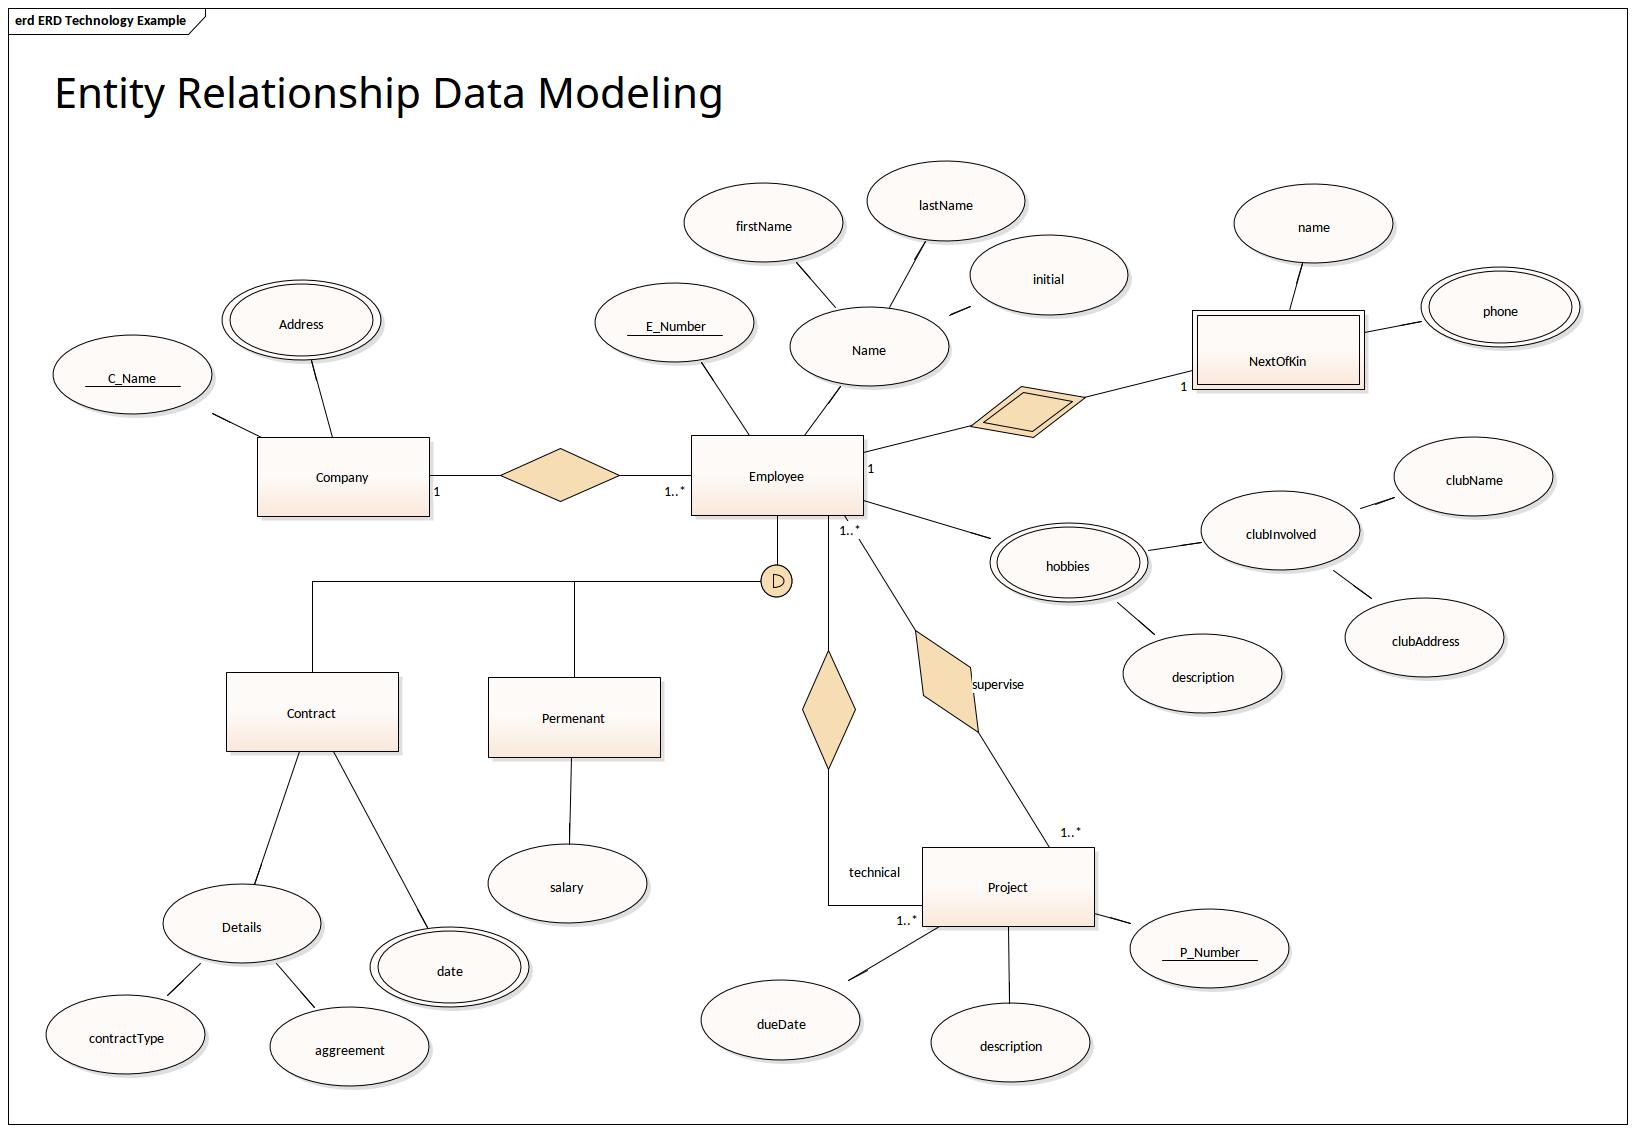 Entity Relationship Data Modeling | Enterprise Architect intended for Er Diagram Logical Model